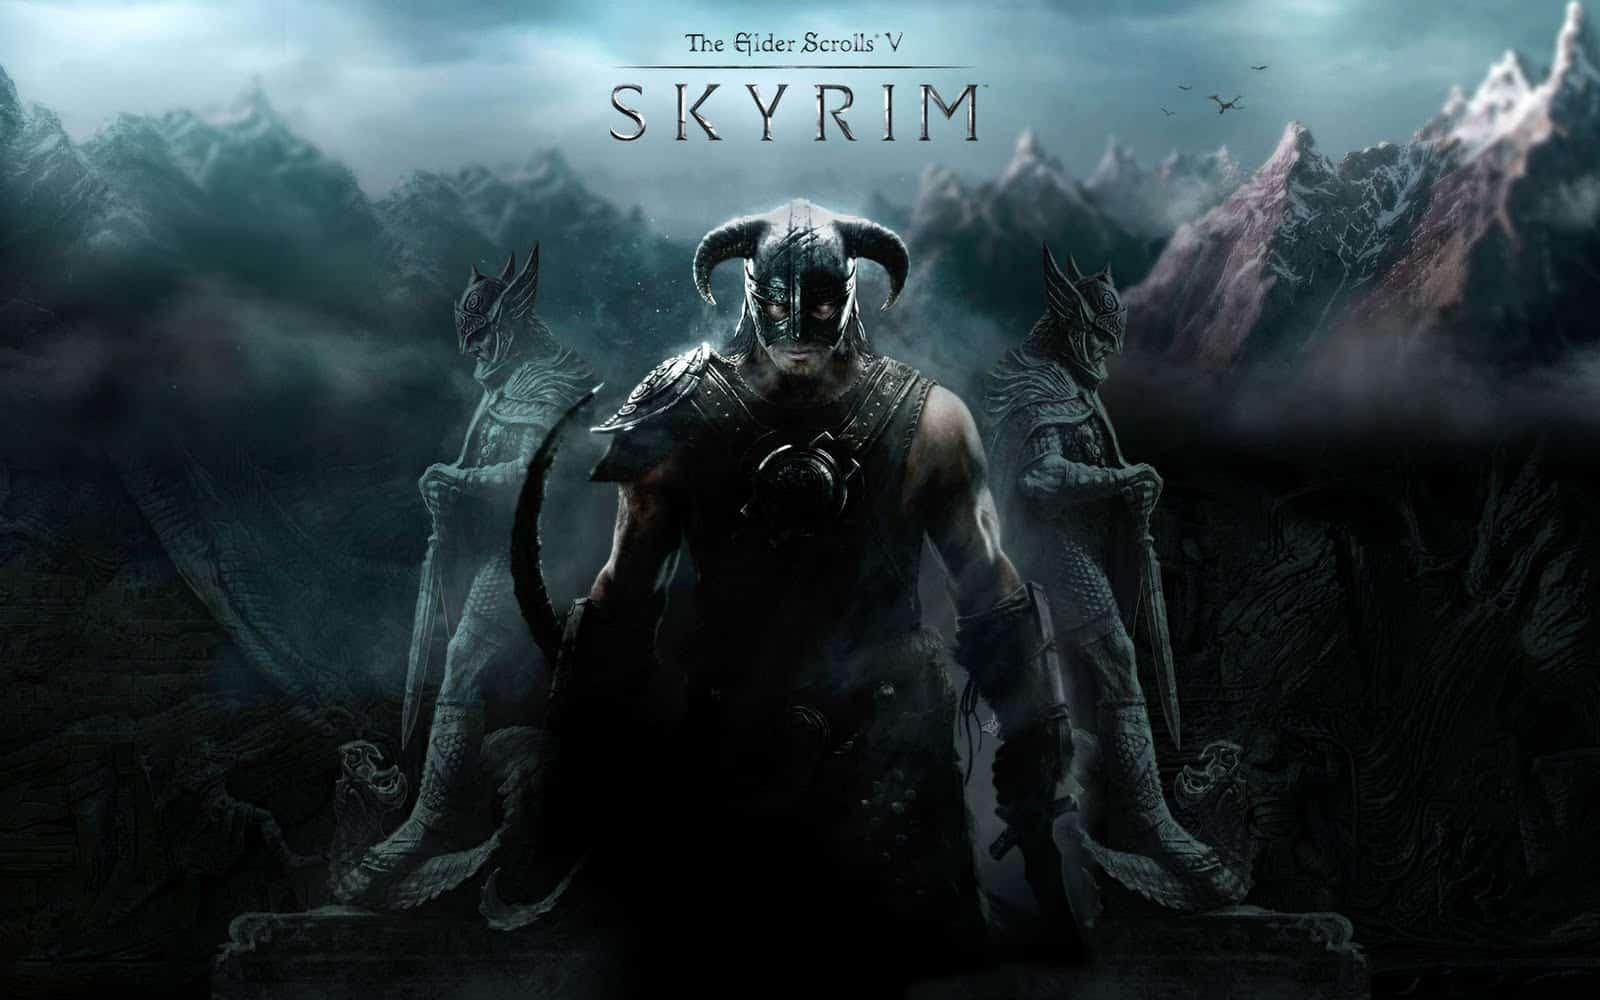 Skyrim – video game soundtrack